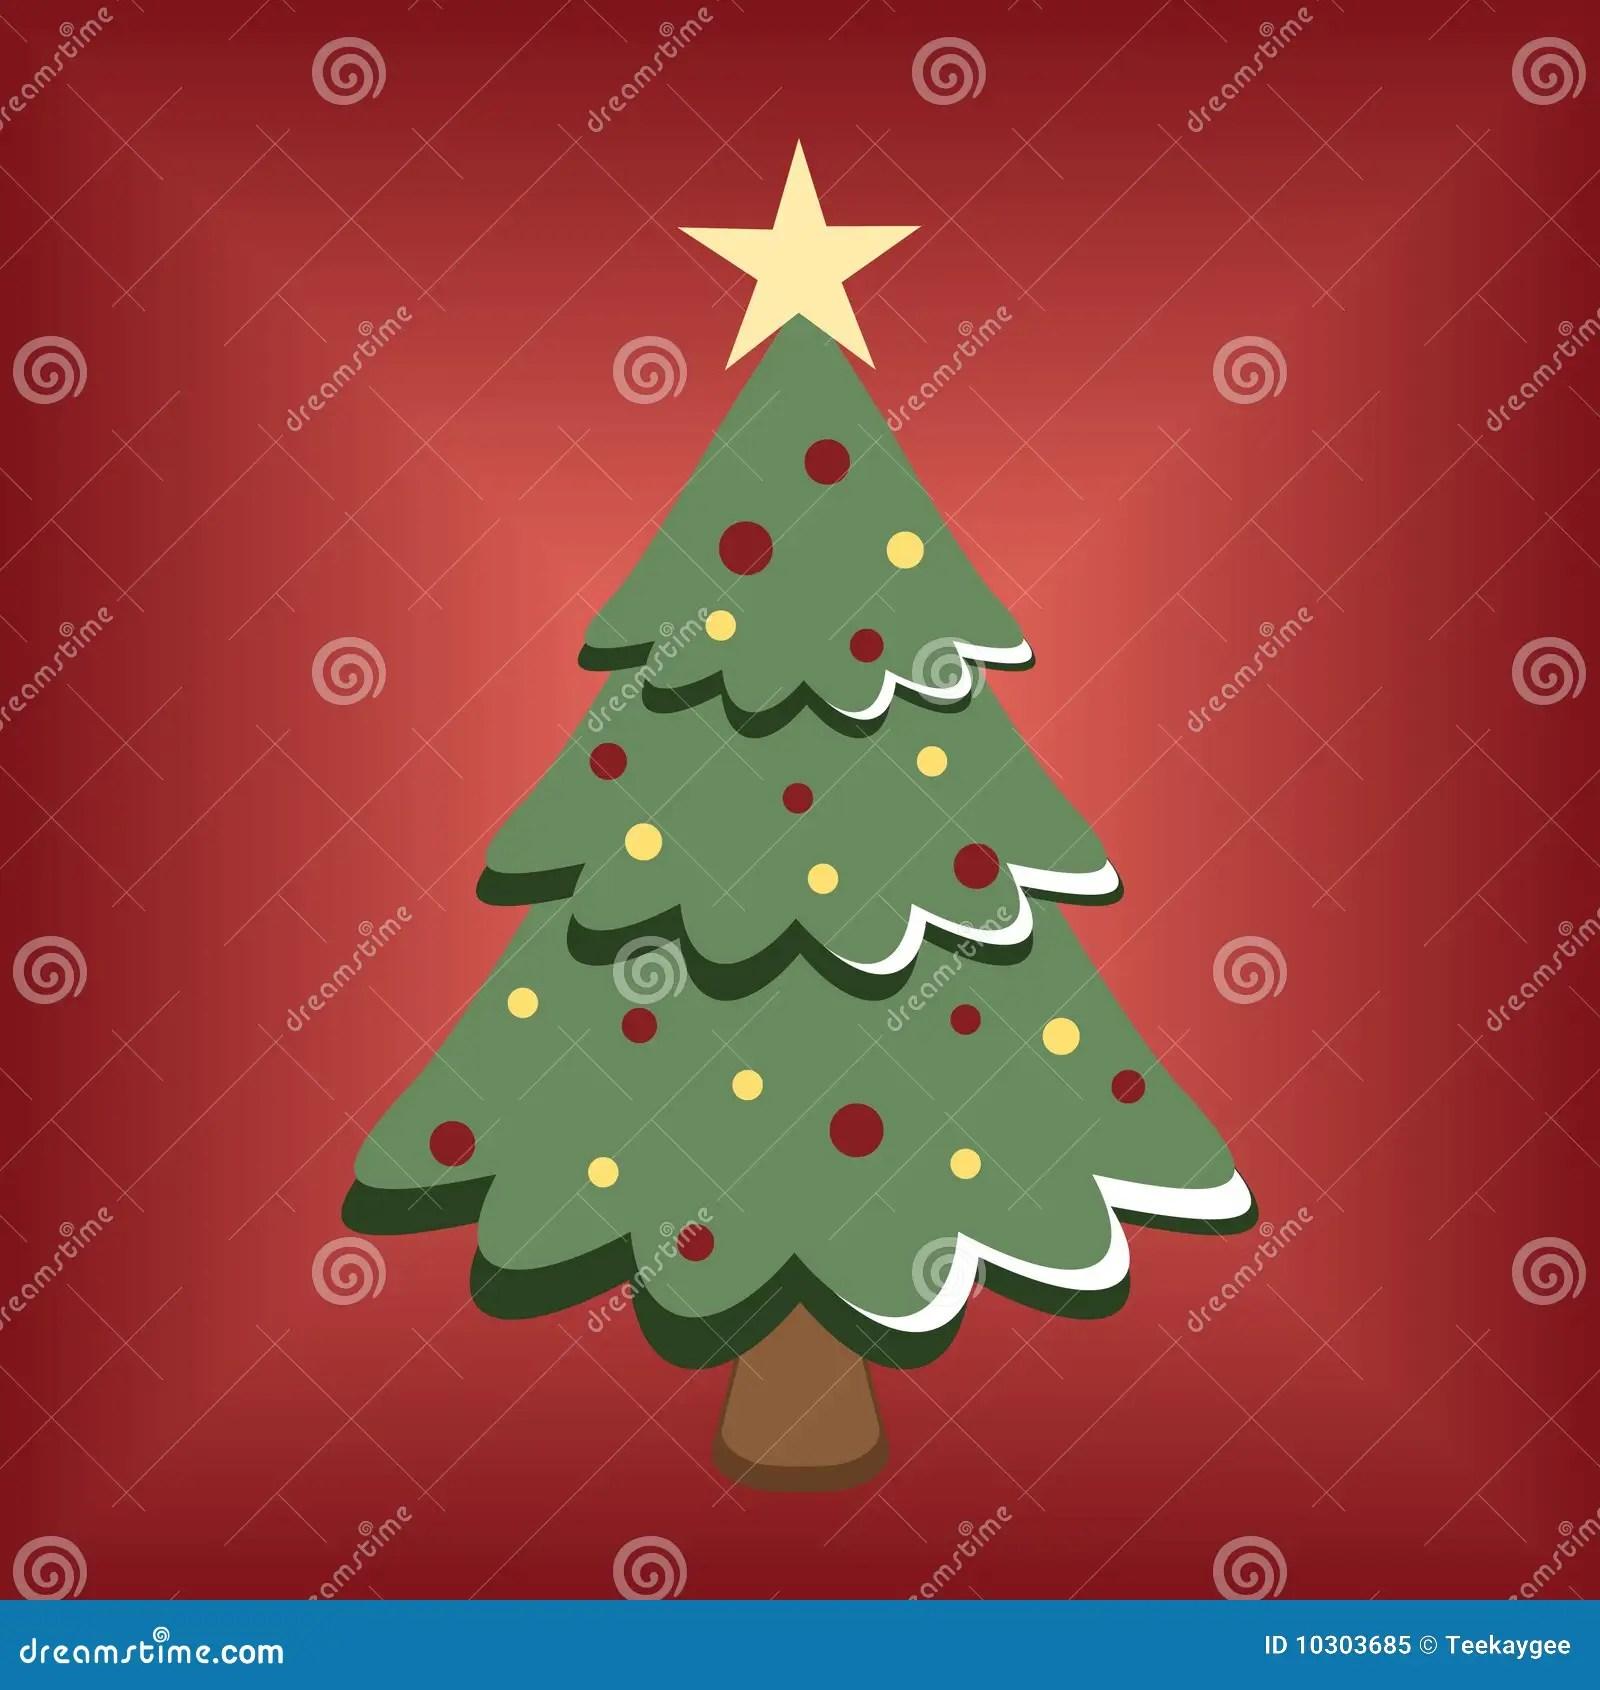 Cartoon Christmas Tree Royalty Free Stock Photo Image